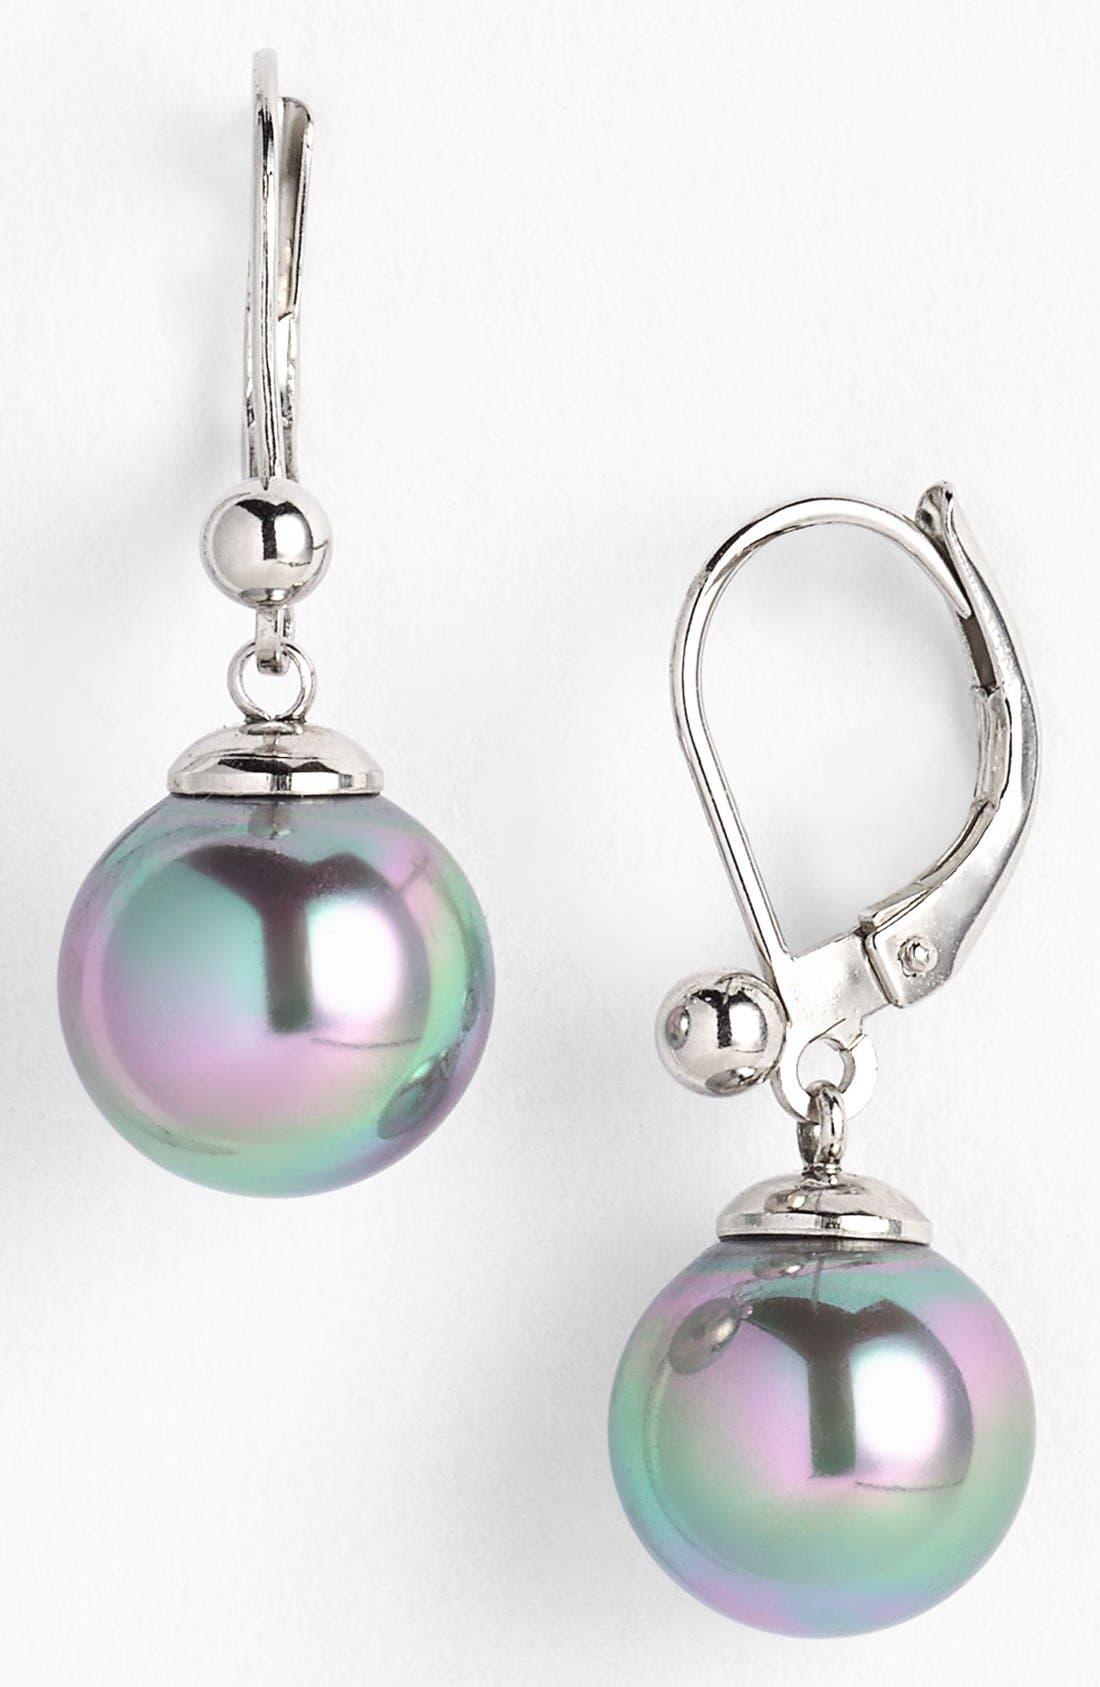 Simulated Pearl Drop Earrings,                         Main,                         color, SILVER/ GREY PEARL